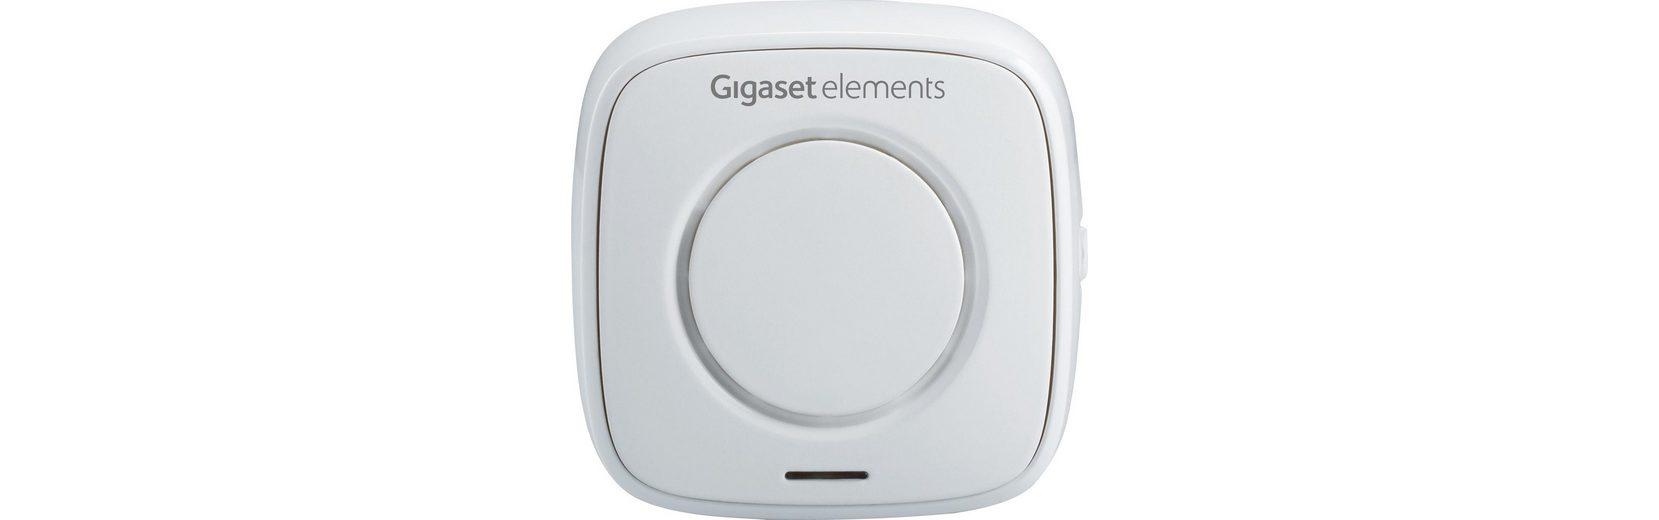 Gigaset Elements siren – Alarmsirene